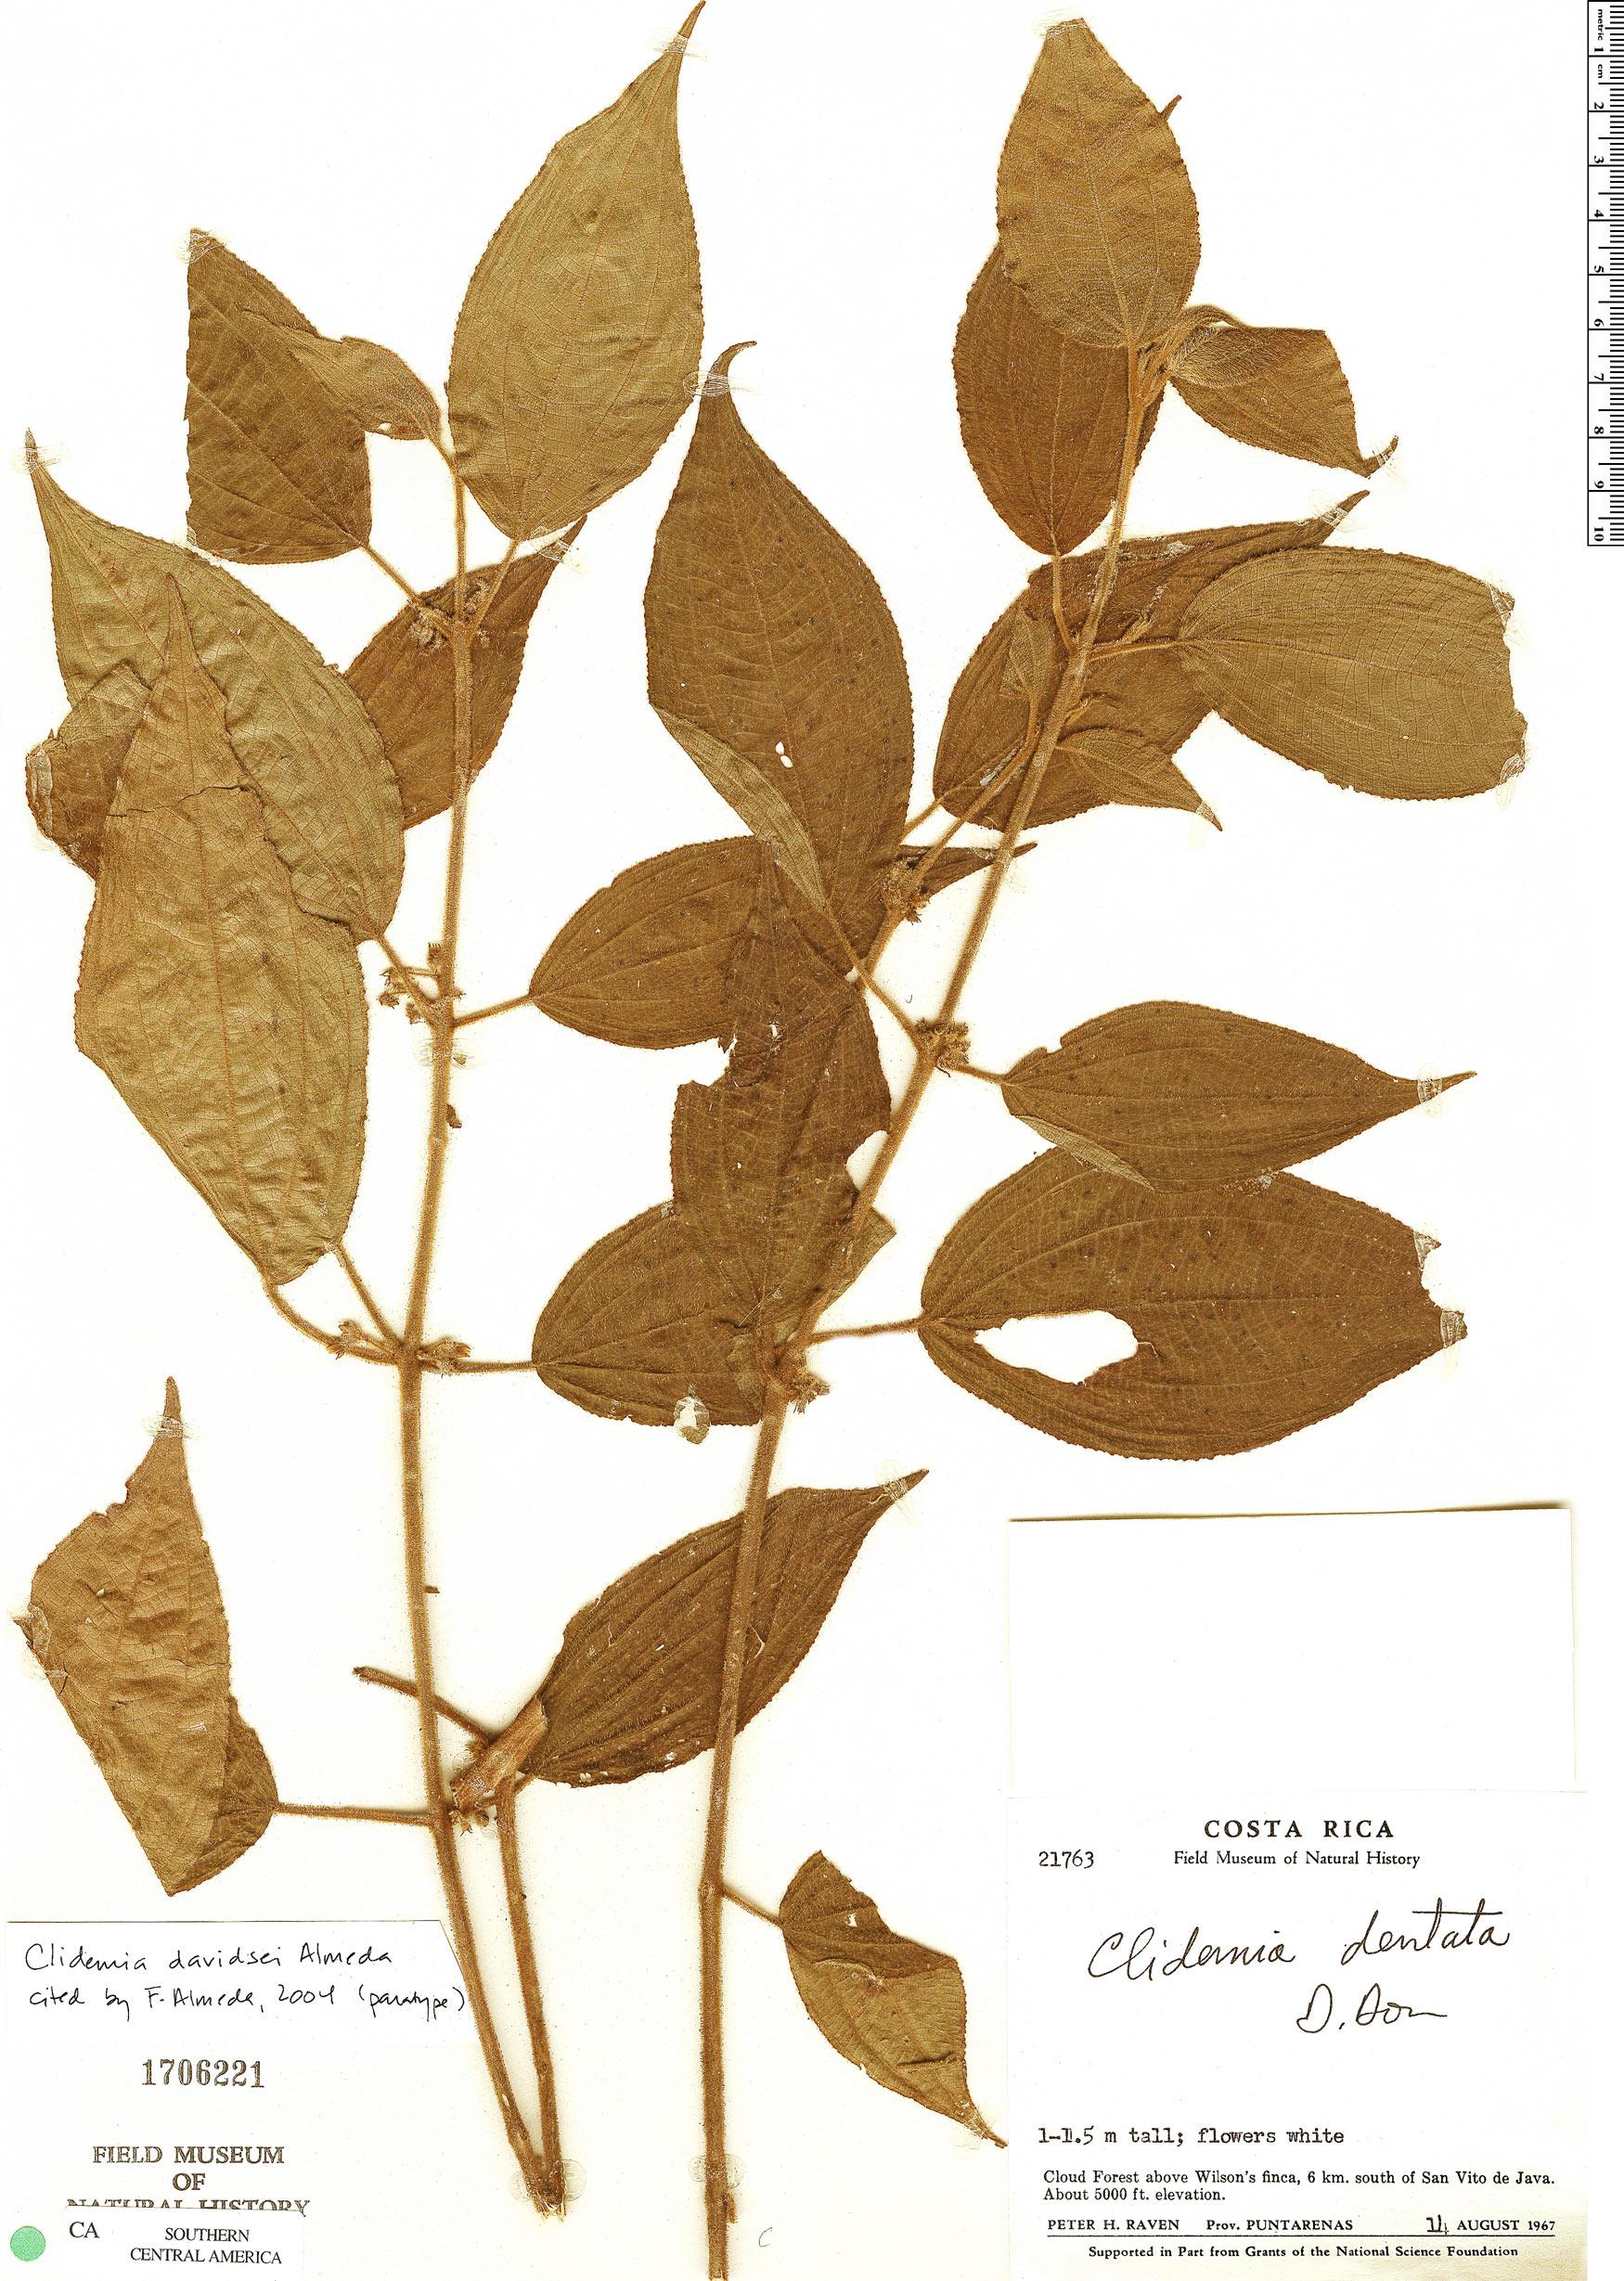 Specimen: Clidemia davidsei